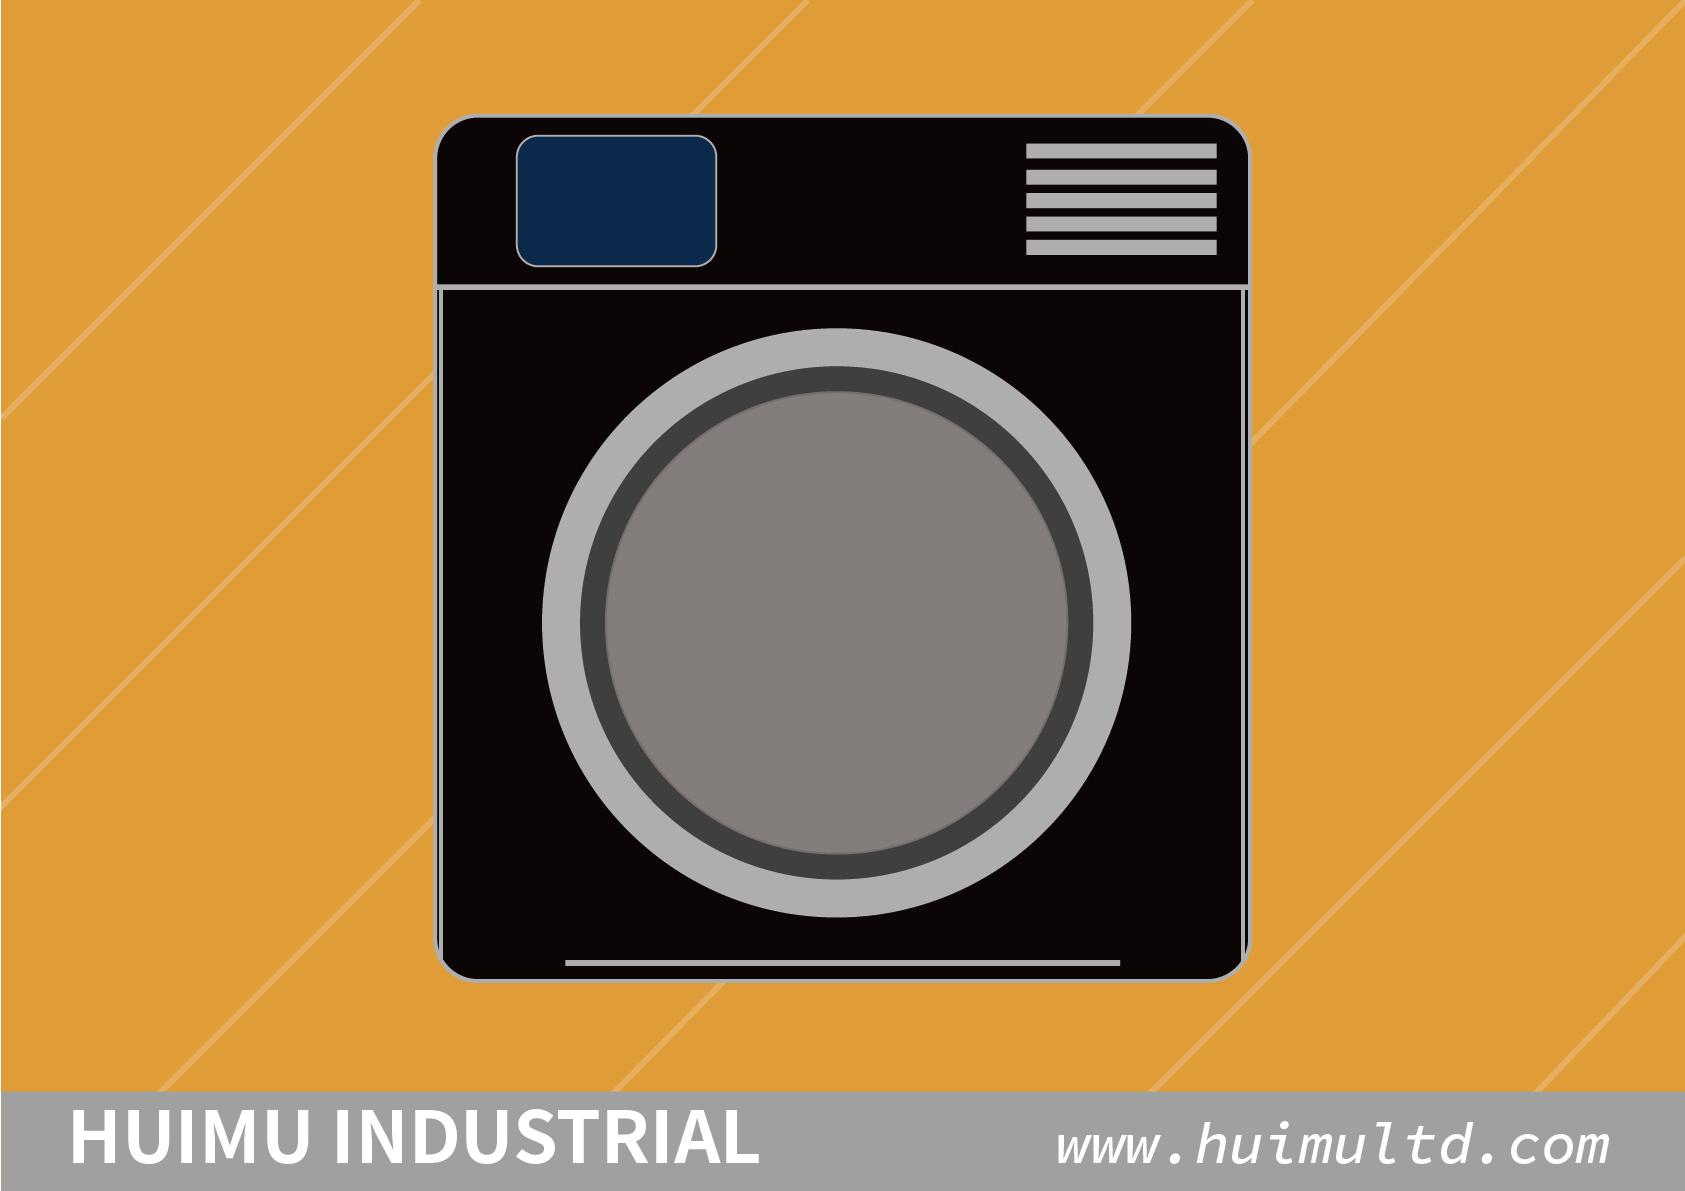 Washing Machine image